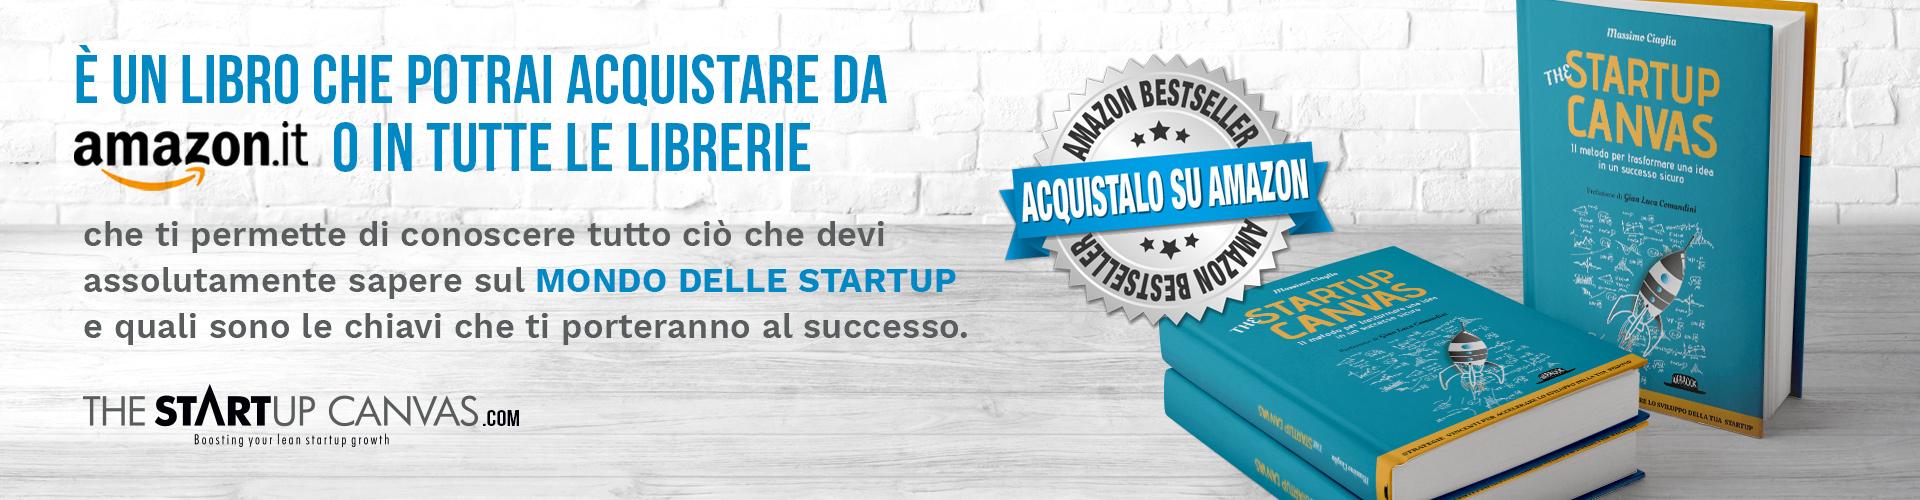 Acquista The Startup Canvas